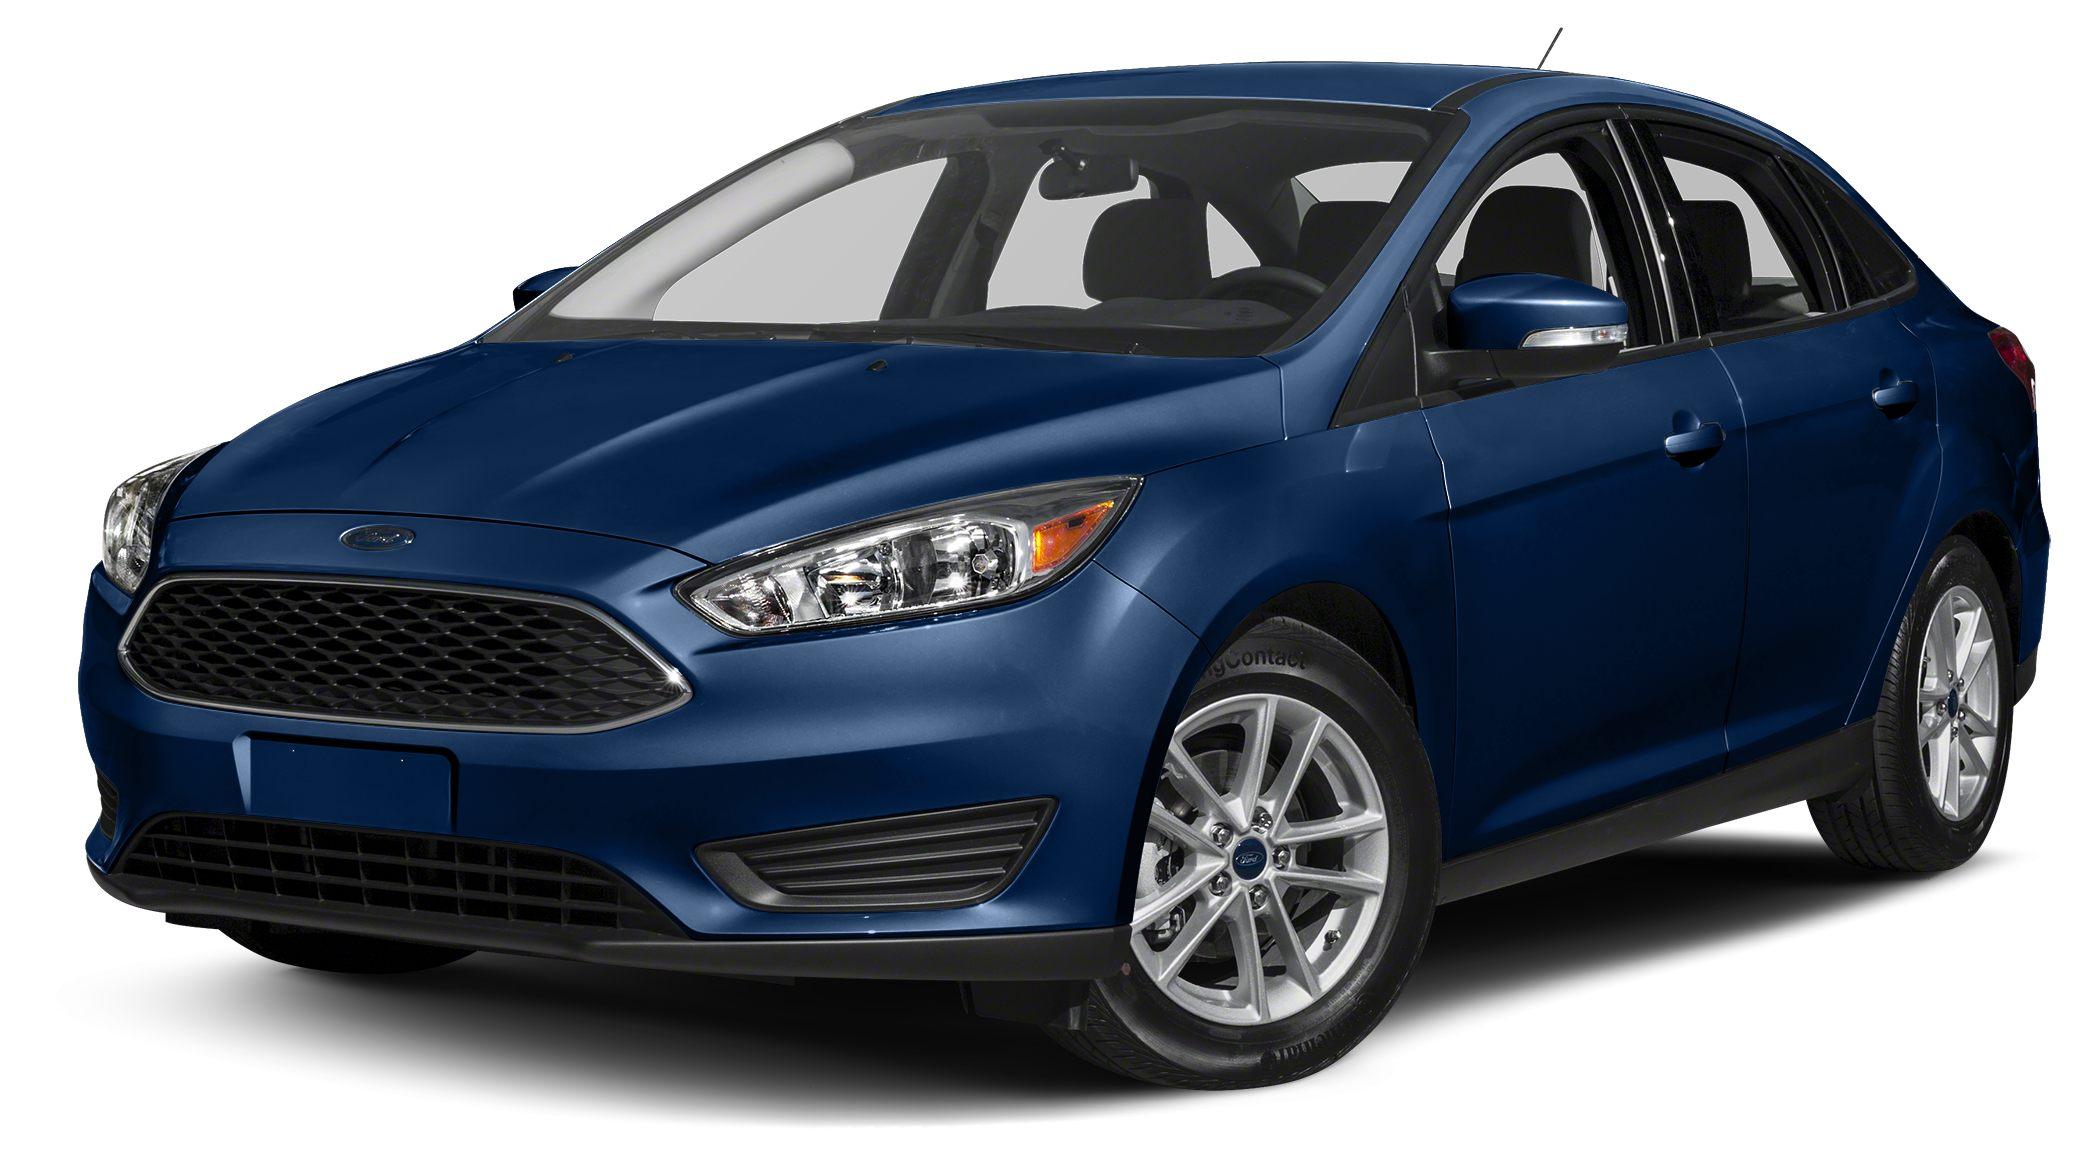 2018 Ford Focus SE Miles 8Color Lightning Blue Metallic Stock 18FO7 VIN 1FADP3F21JL275566